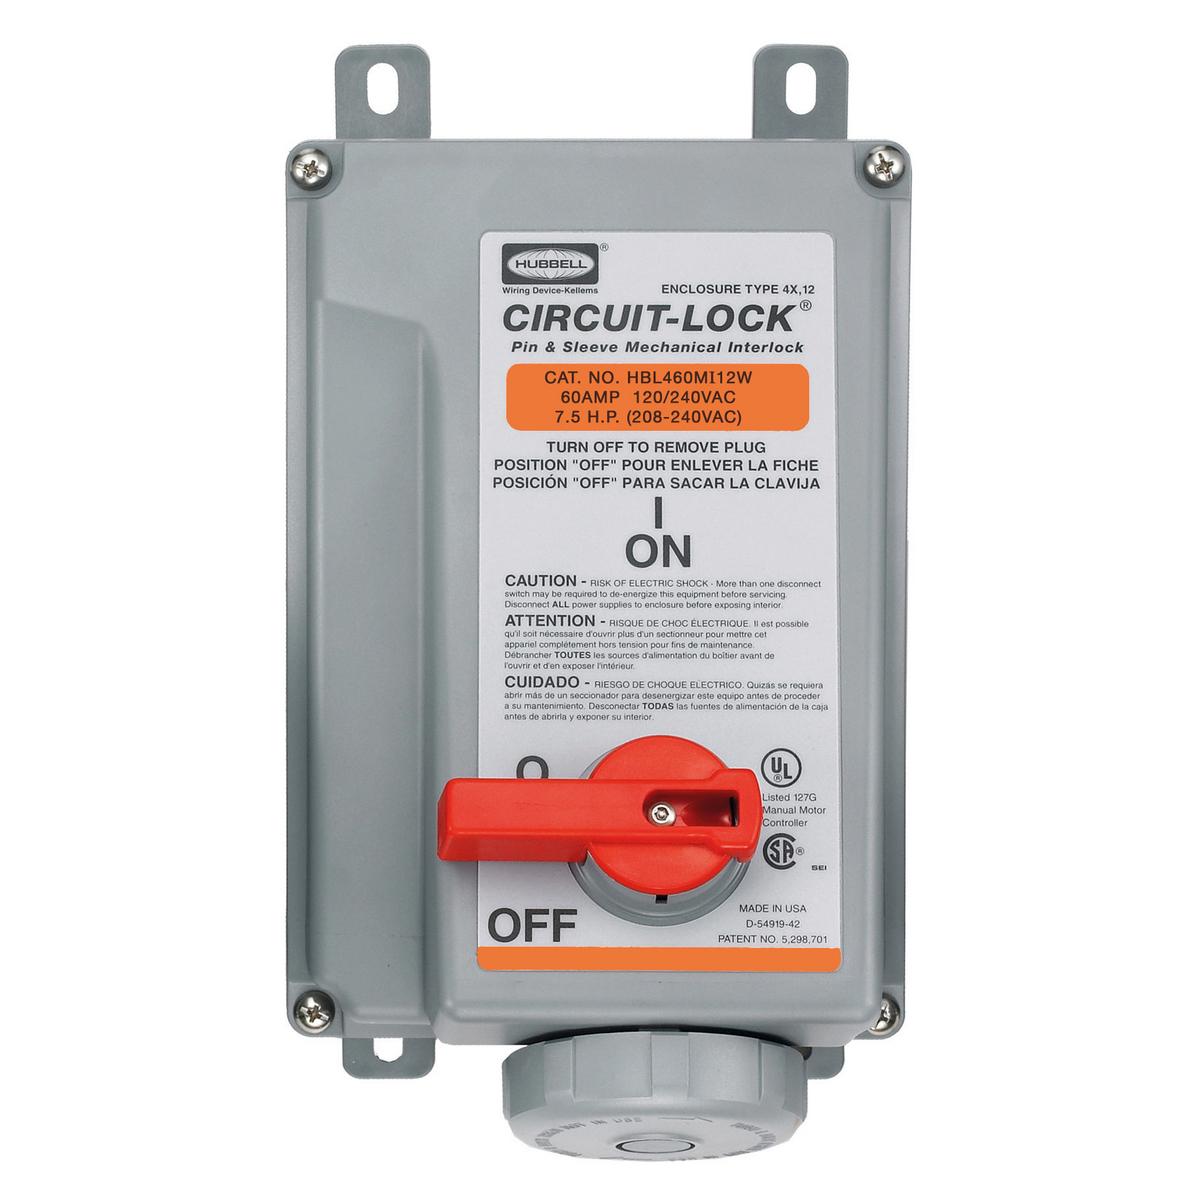 Hubbell HBL460MI12W 60 Amp 120/240 Volt 3-Pole 4-Wire Watertight IEC Pin and Sleeve Mechanical Interlock